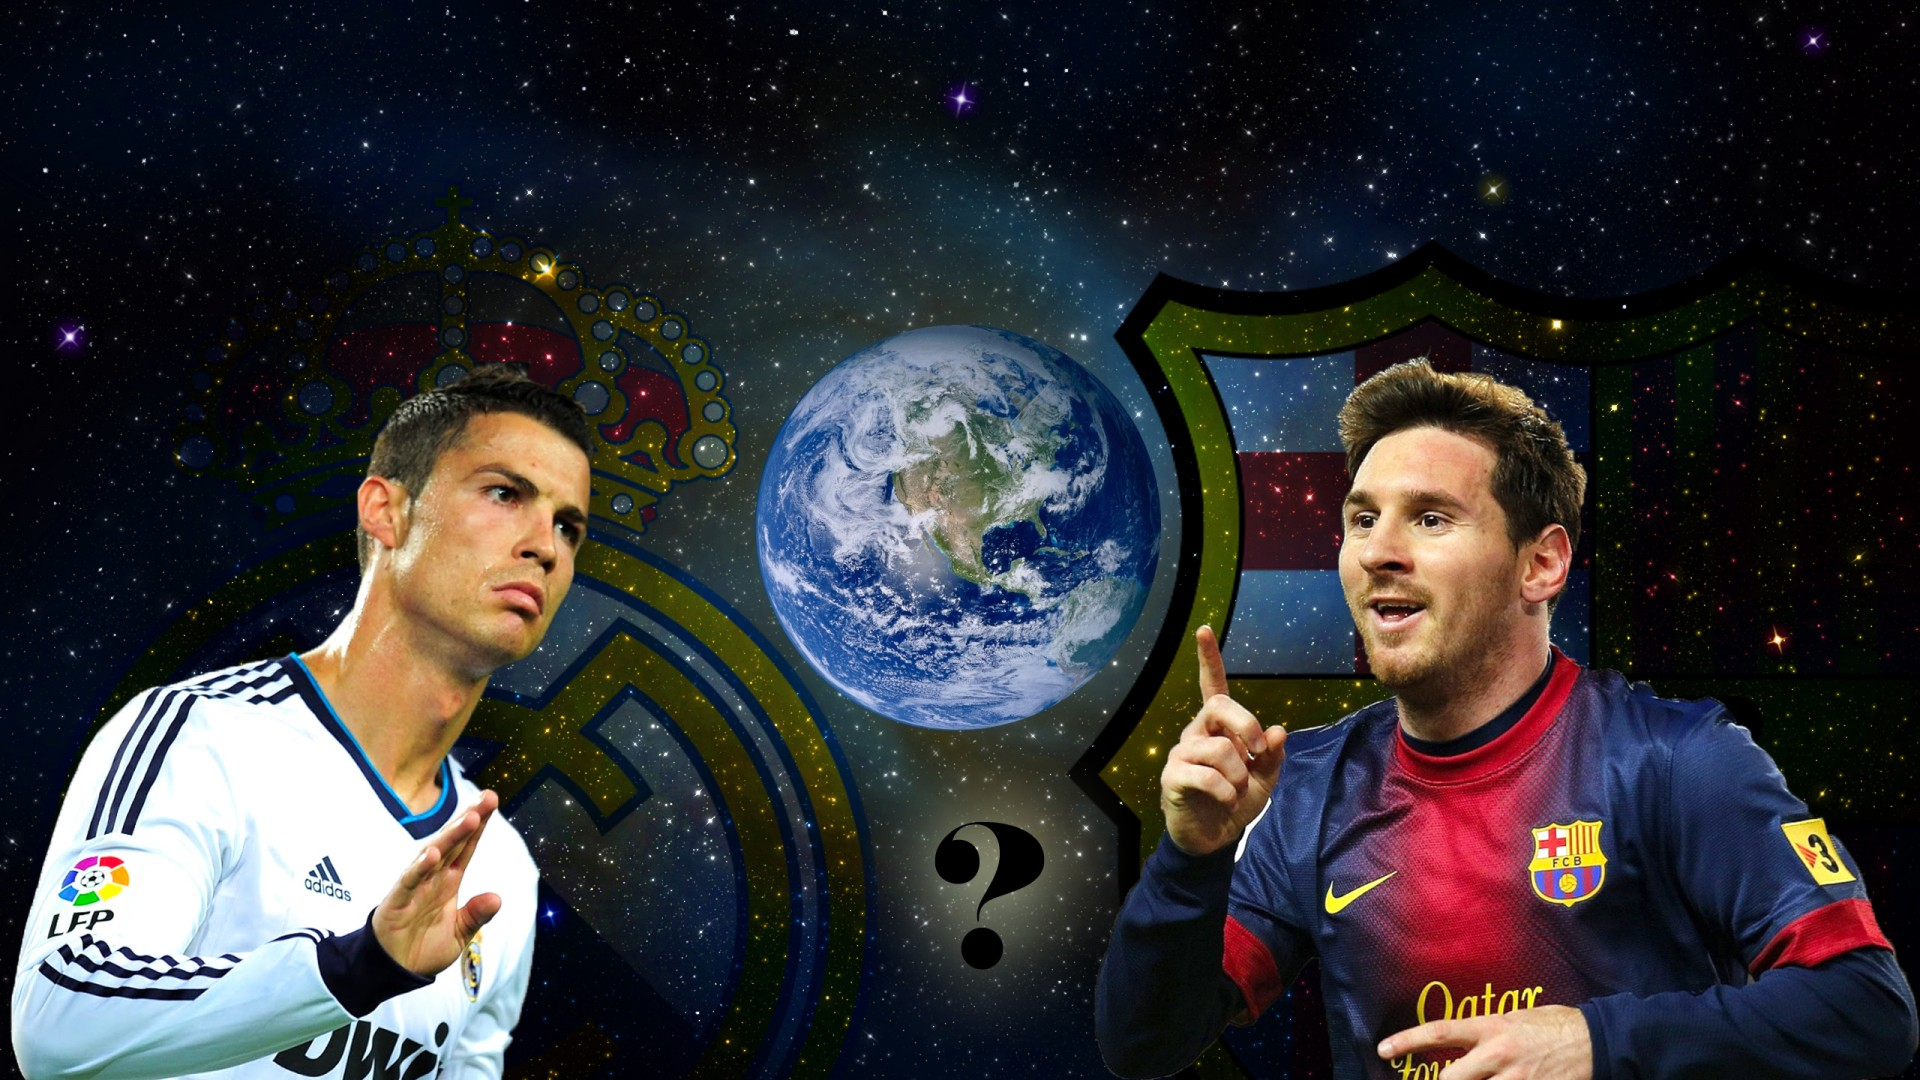 Ronaldo vs Messi wallpaper - Cristiano Ronaldo Wallpapers